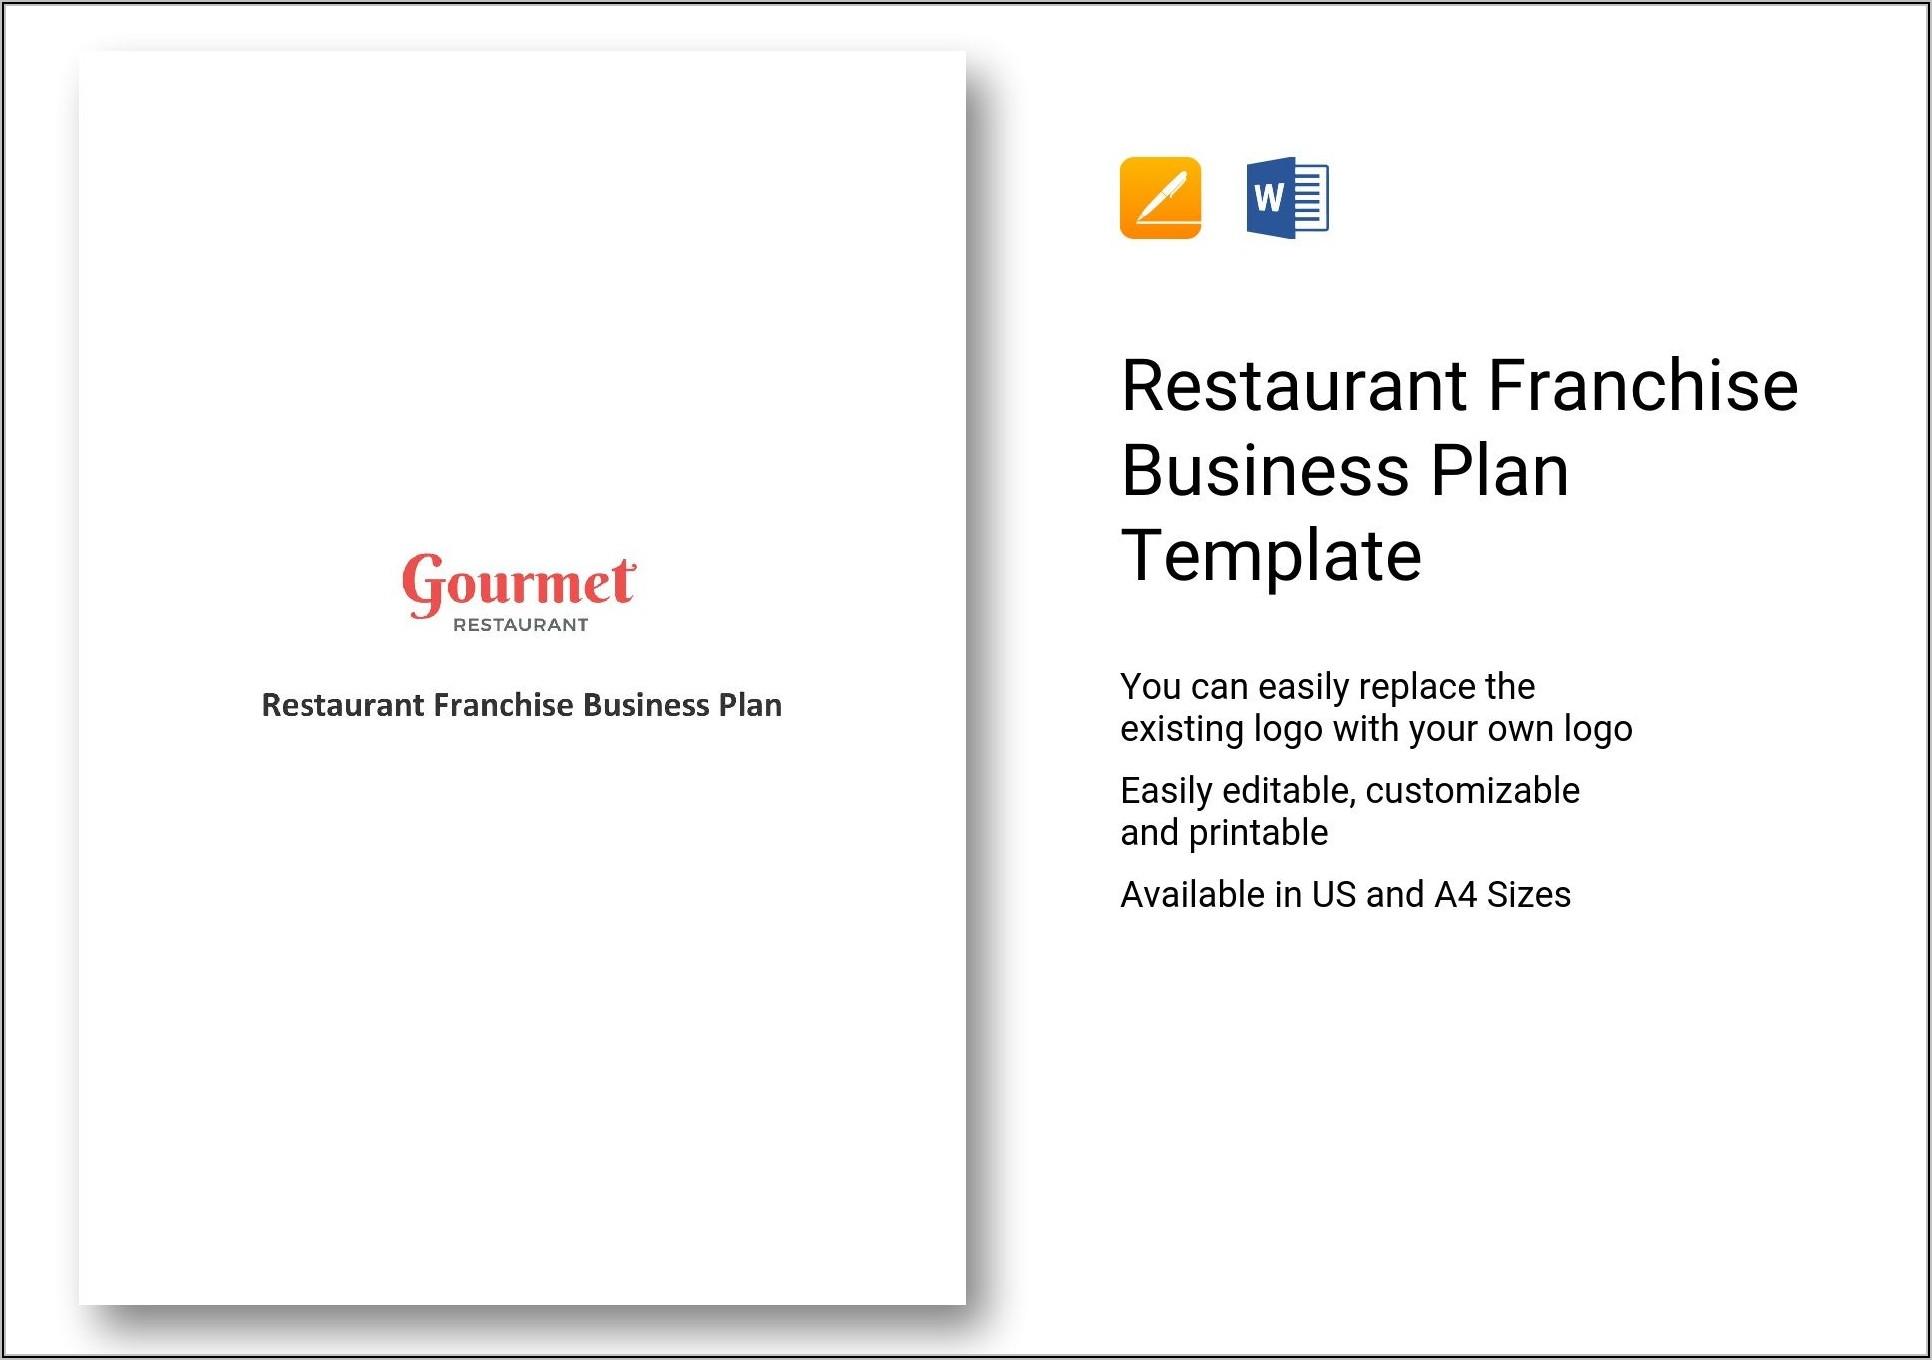 Franchise Restaurant Business Plan Template